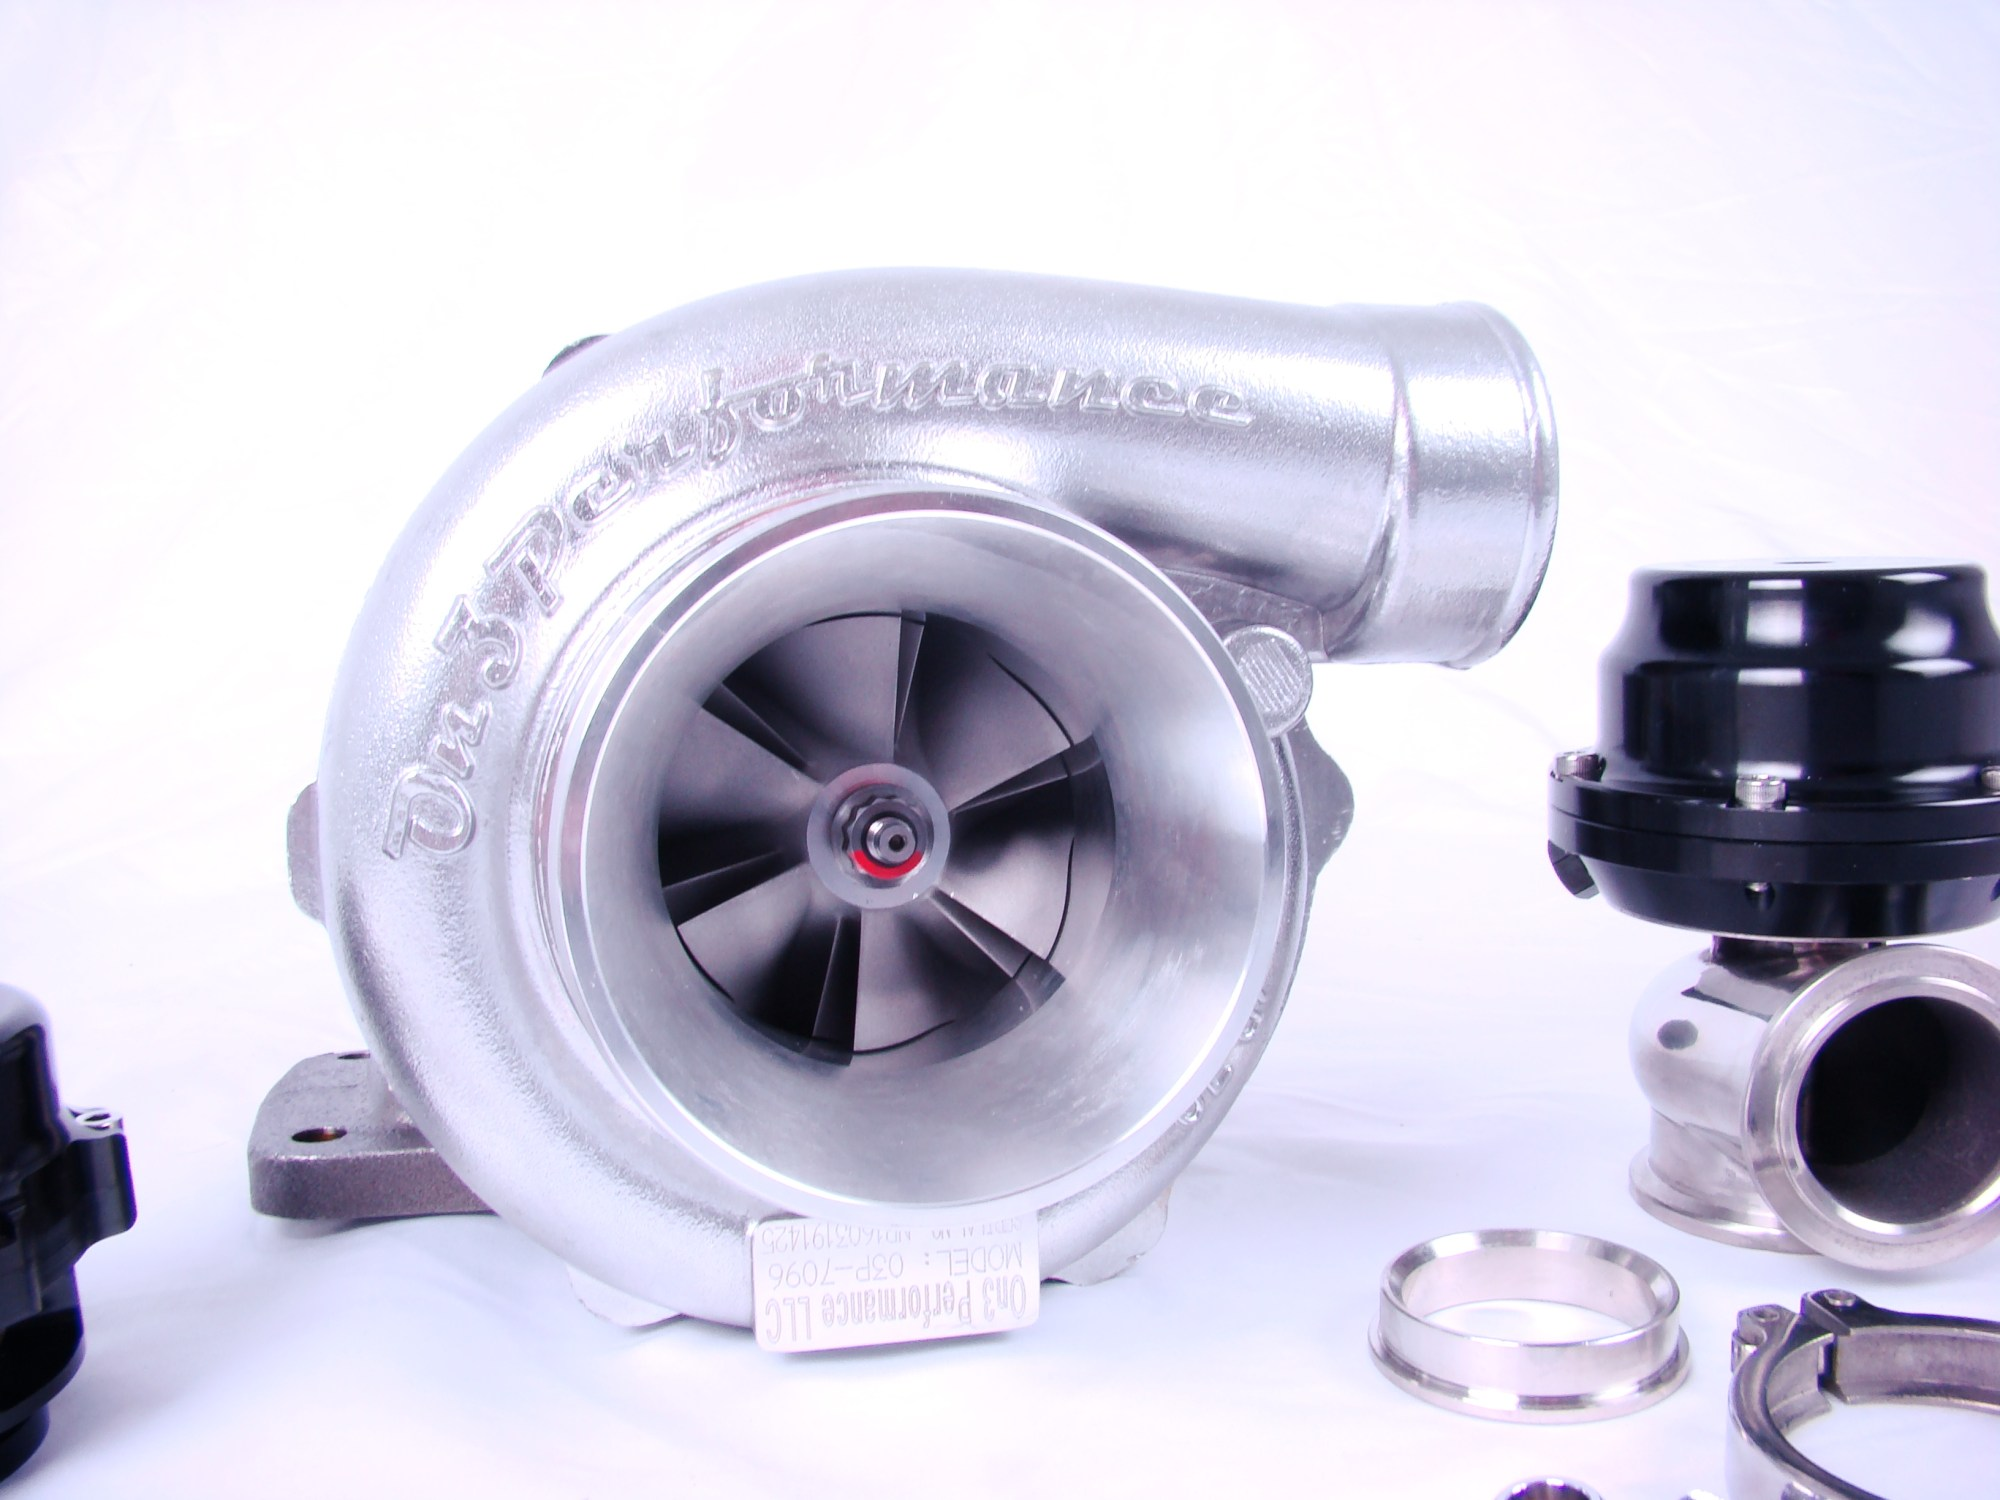 hight resolution of 2007 2013 chevy gmc silverado sierra 1500 2500 truck turbo system